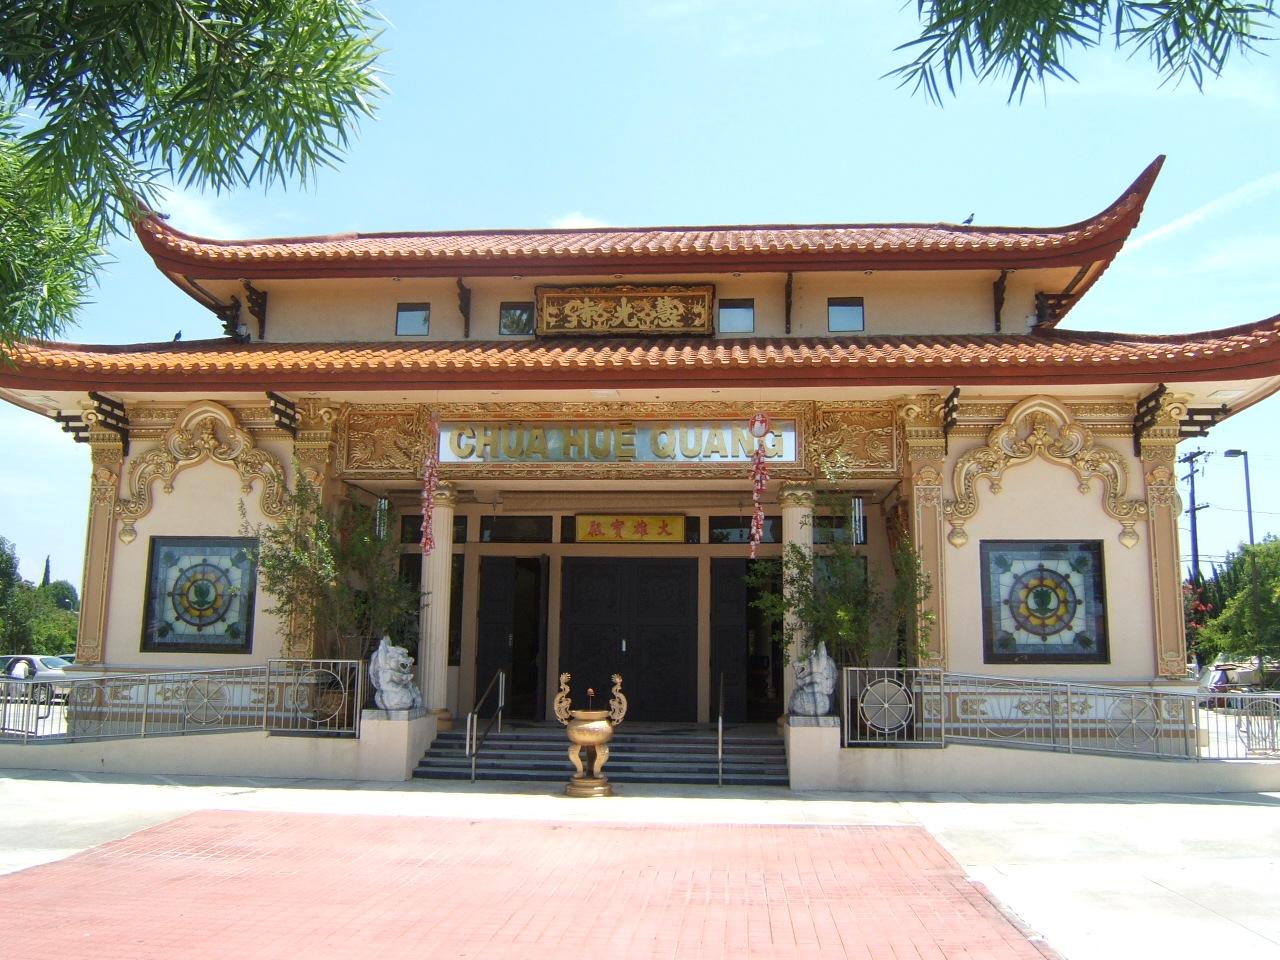 File:Garden Grove Vietnamese Buddhist Temple.jpg - Wikimedia Commons